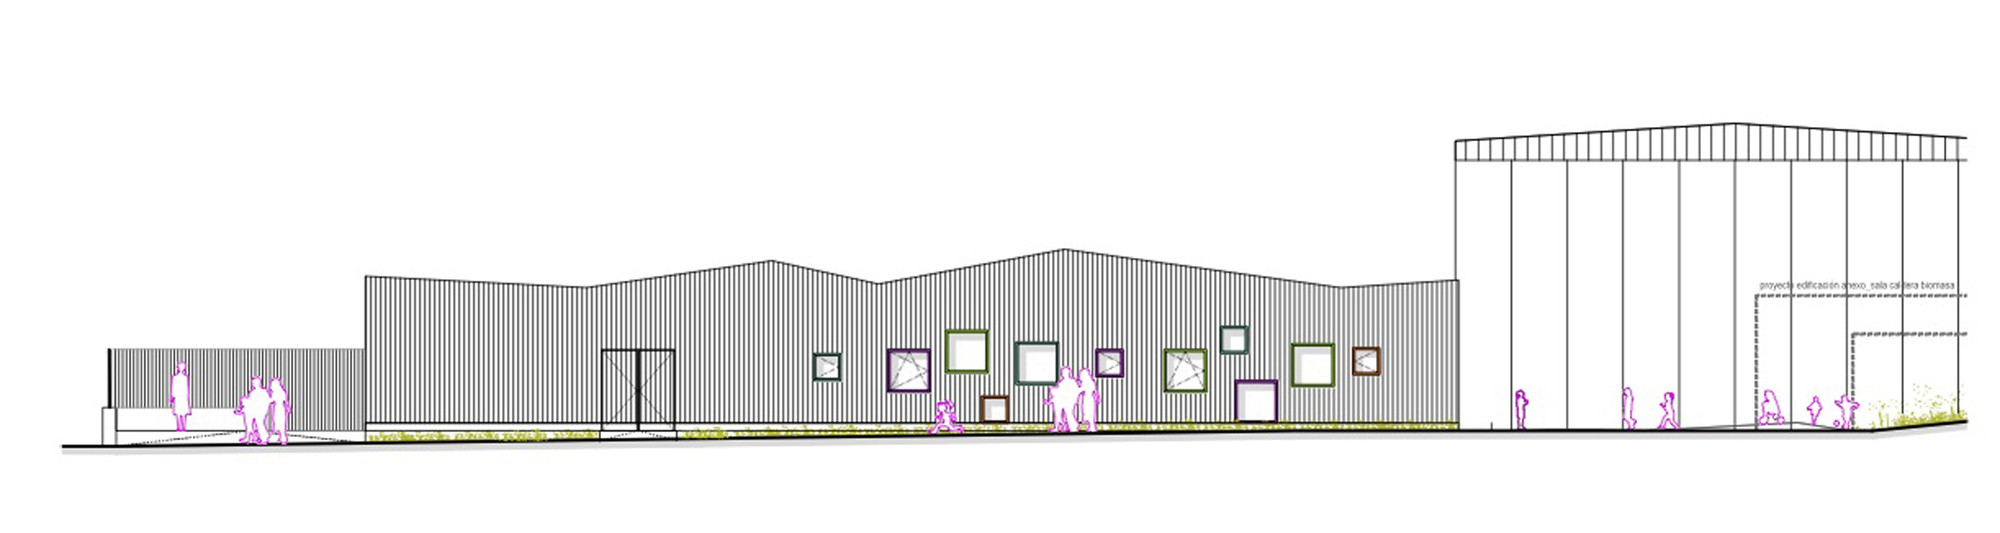 Gallery of New Building for Nursery and Kindergarten in